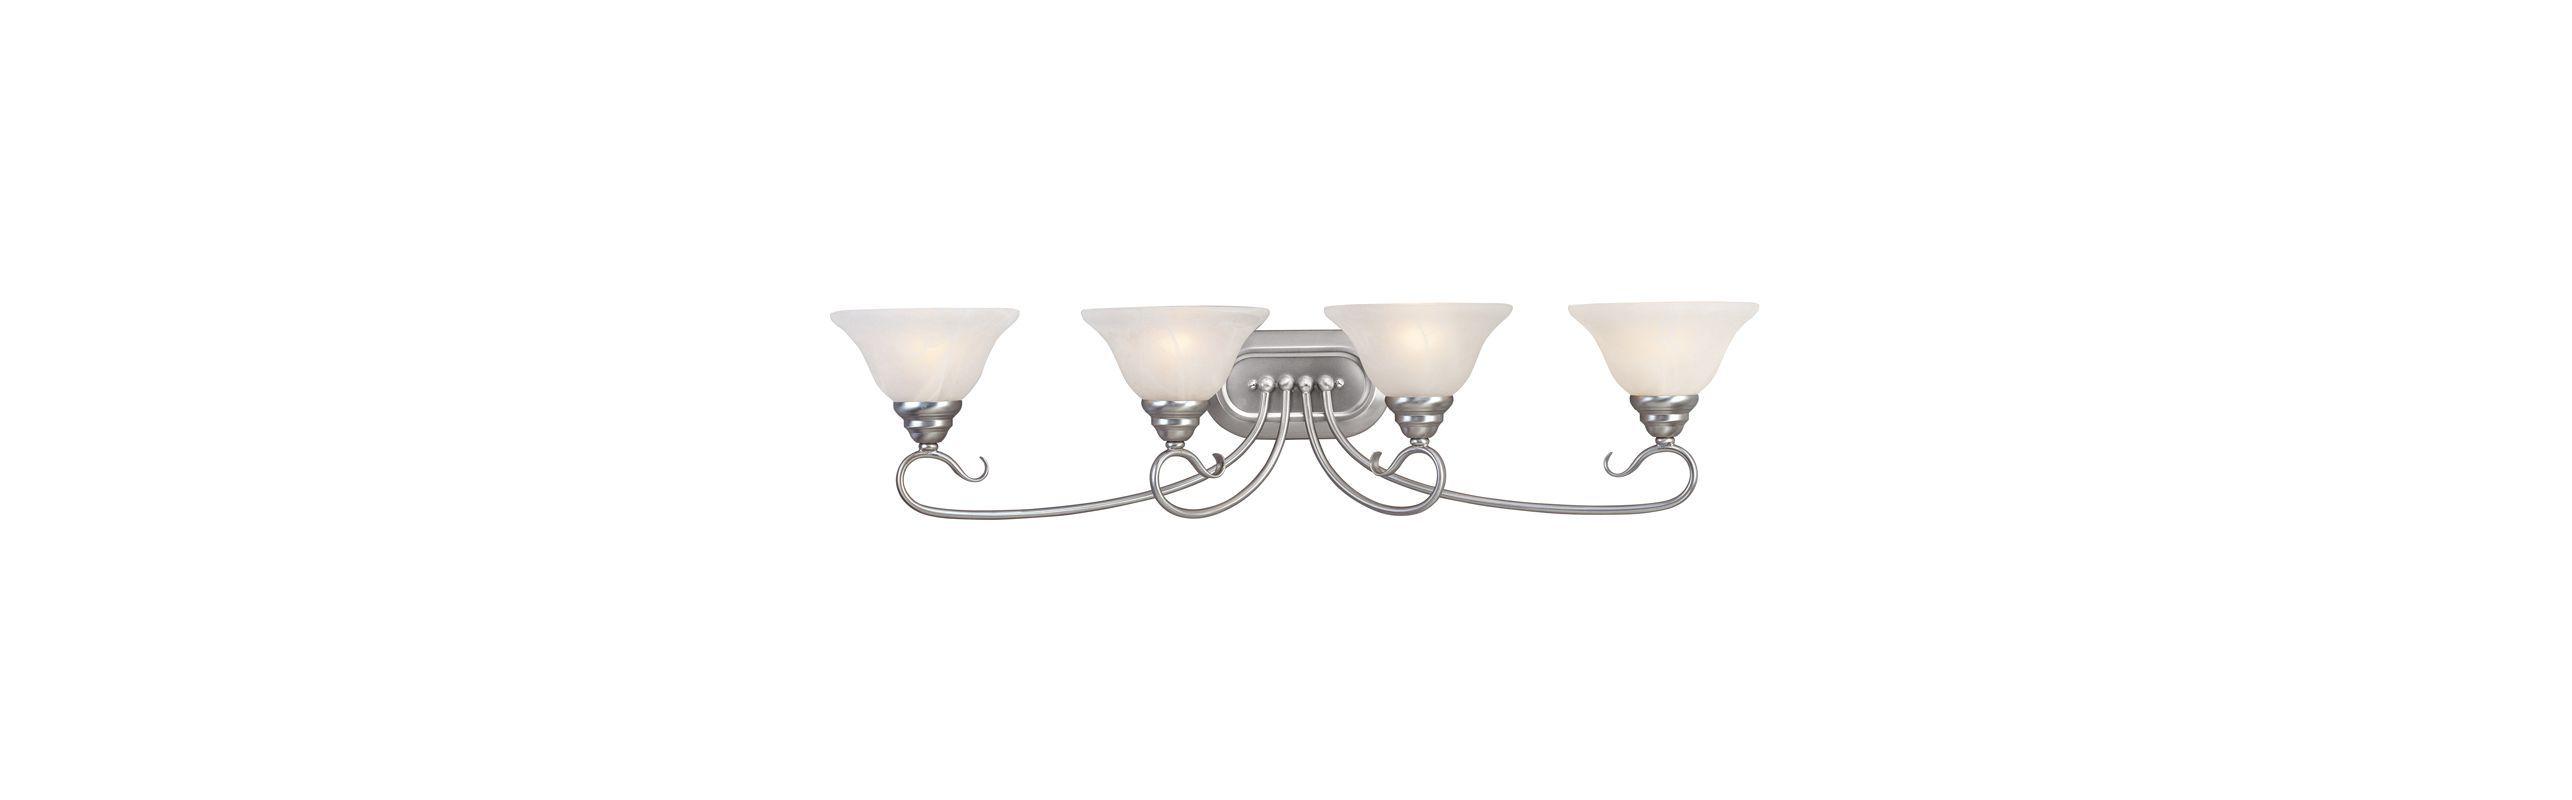 Photo of Livex Lighting 6104-91 Brushed Nickel Coronado 4 Light Bathroom Vanity Light